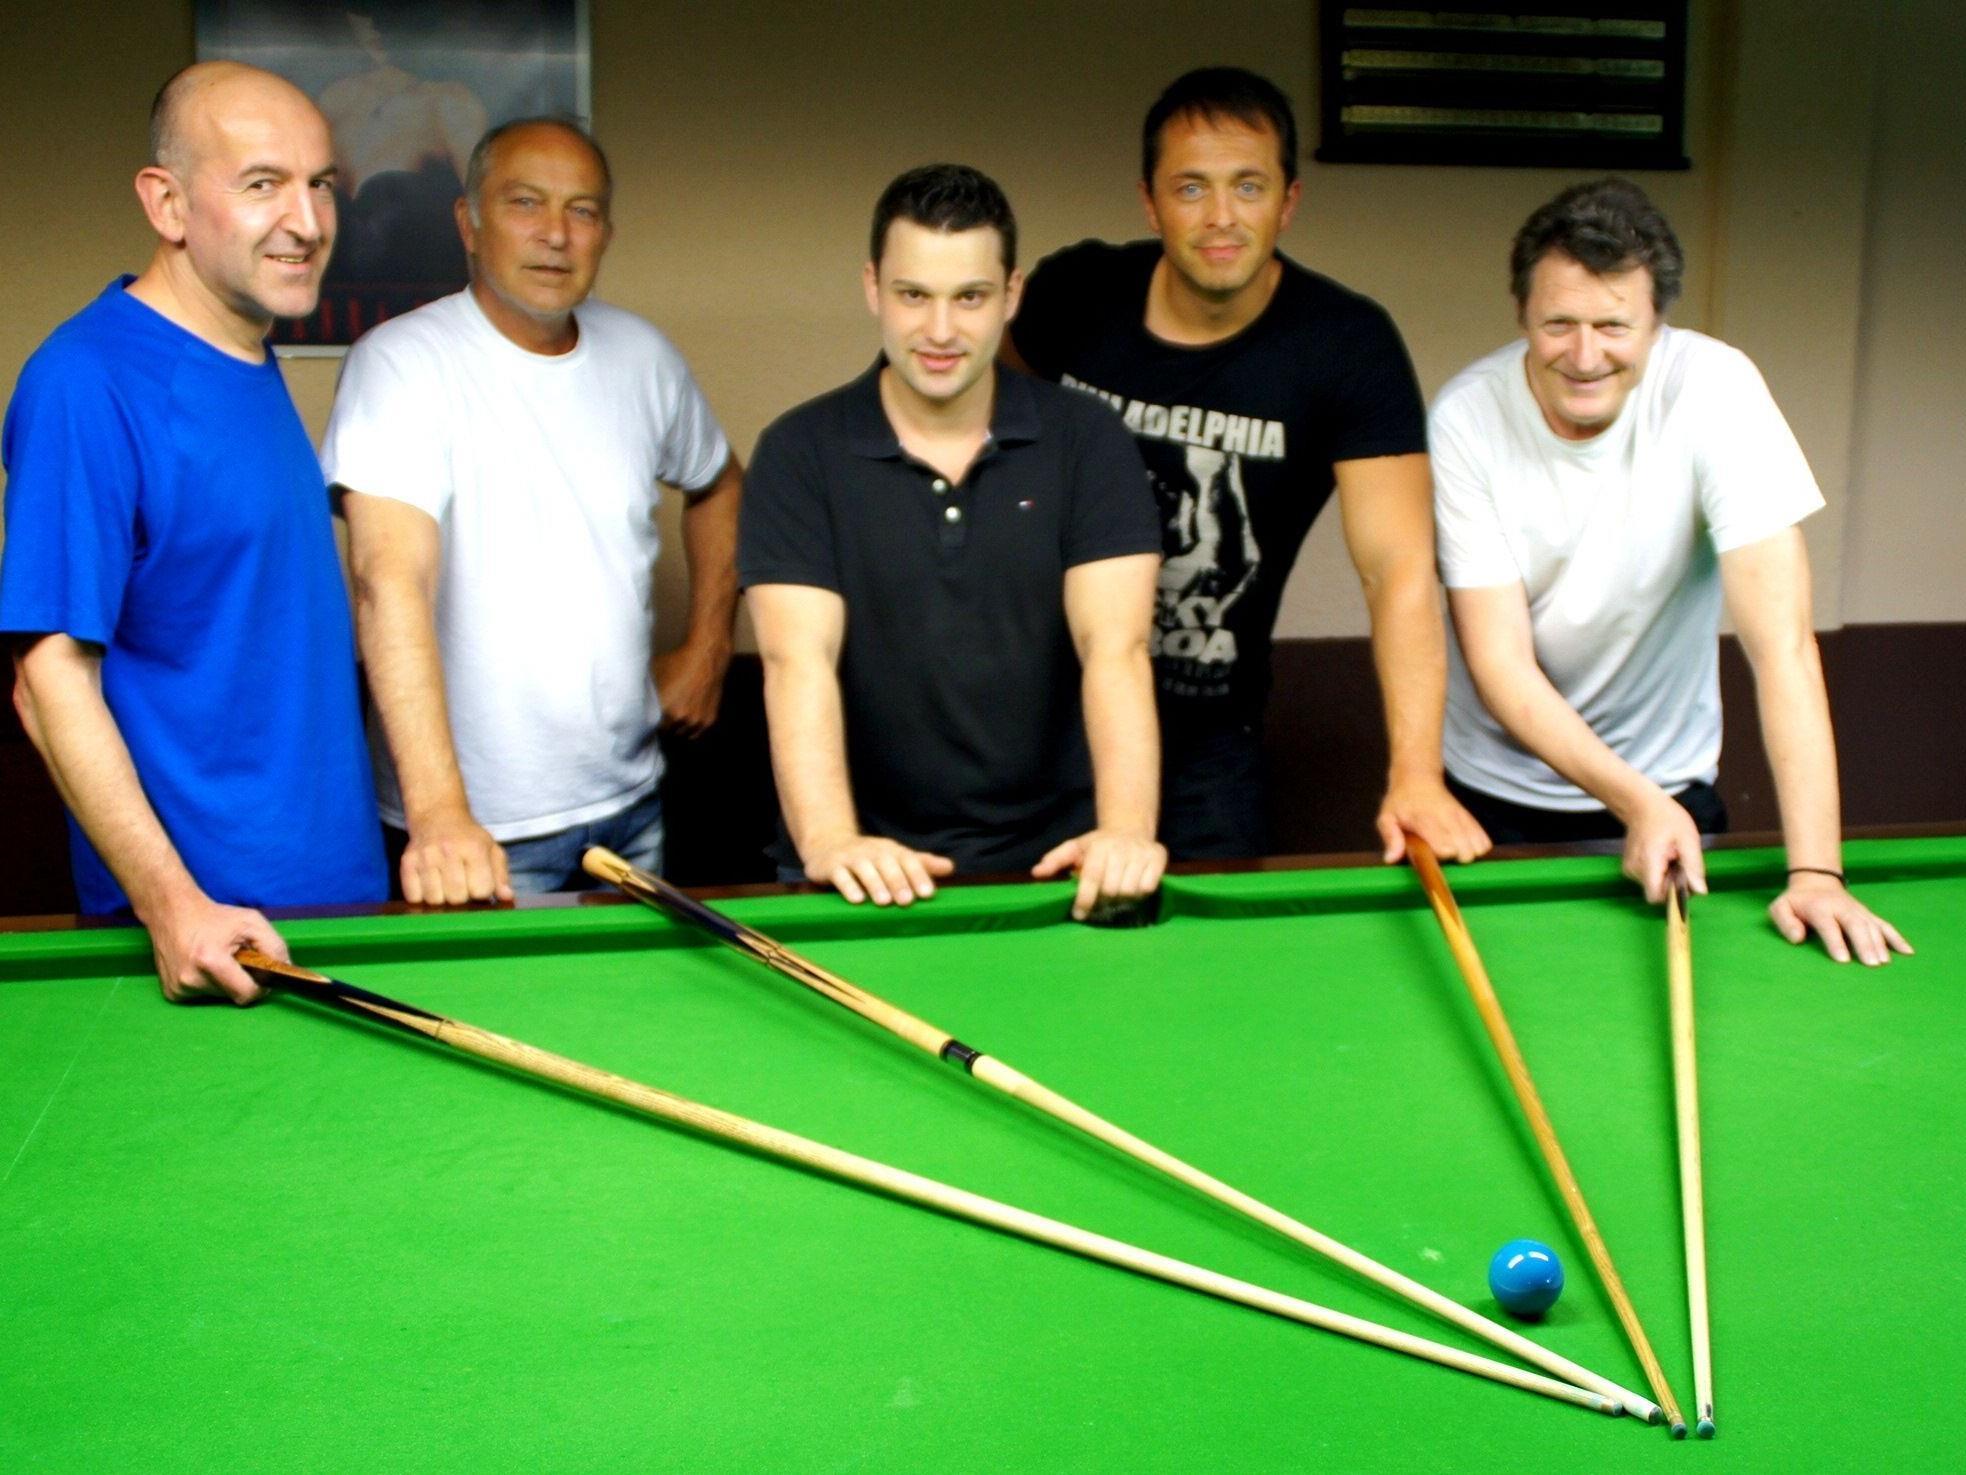 Snookers unter sich